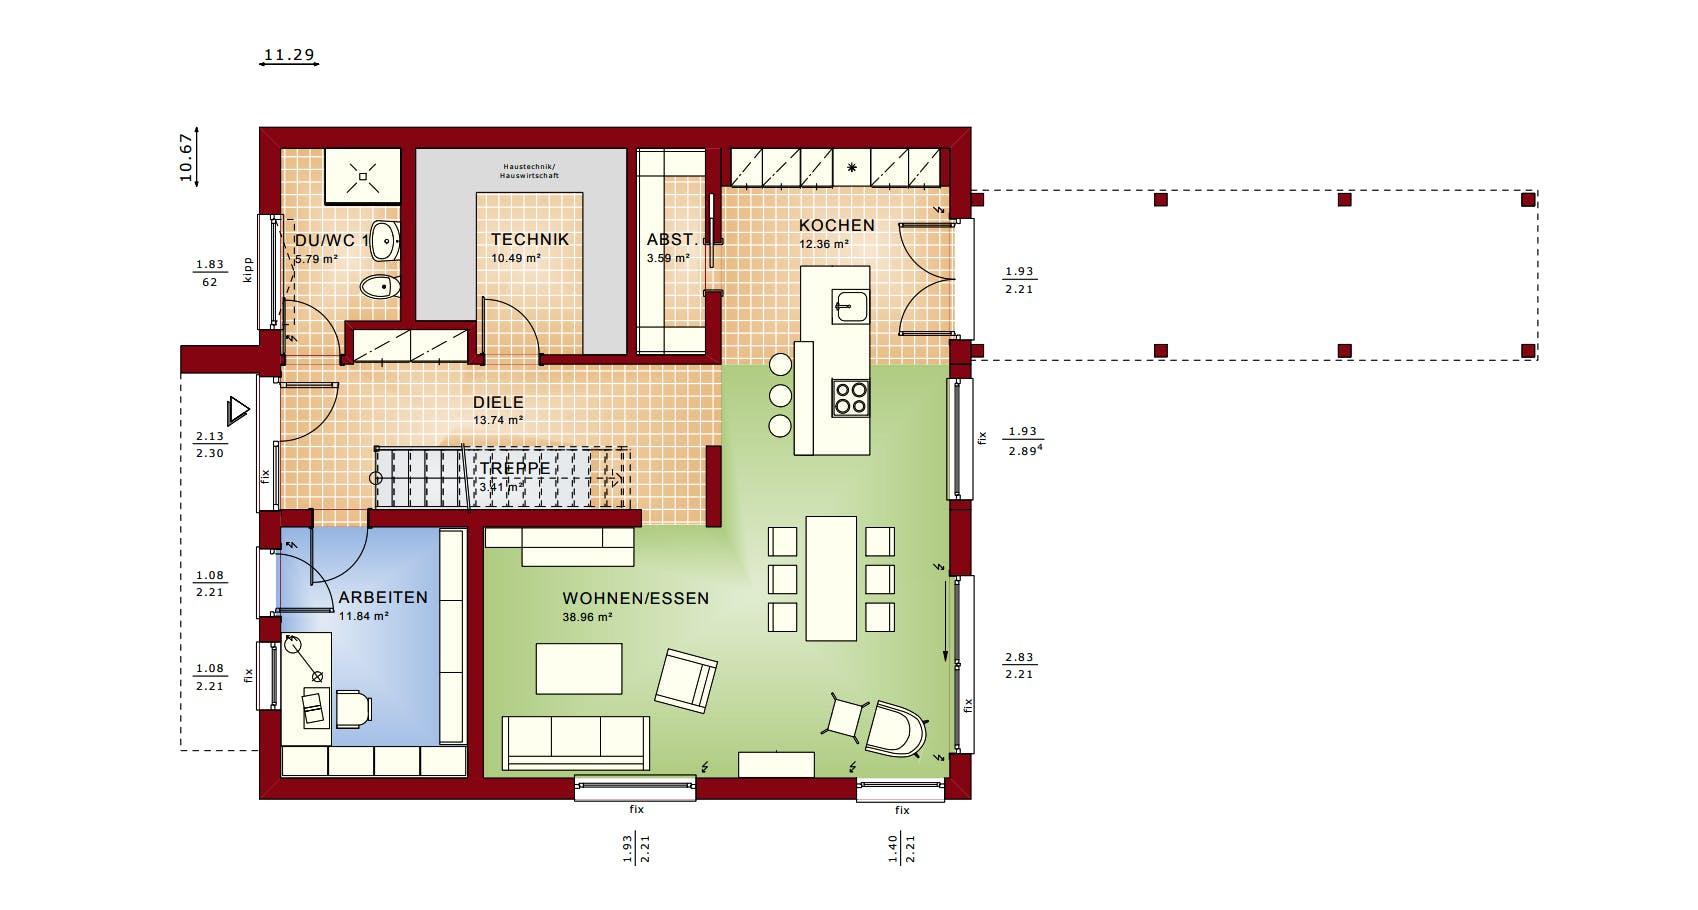 Grundriss vom Erdgeschoss eines Bien-Zenker Hauses